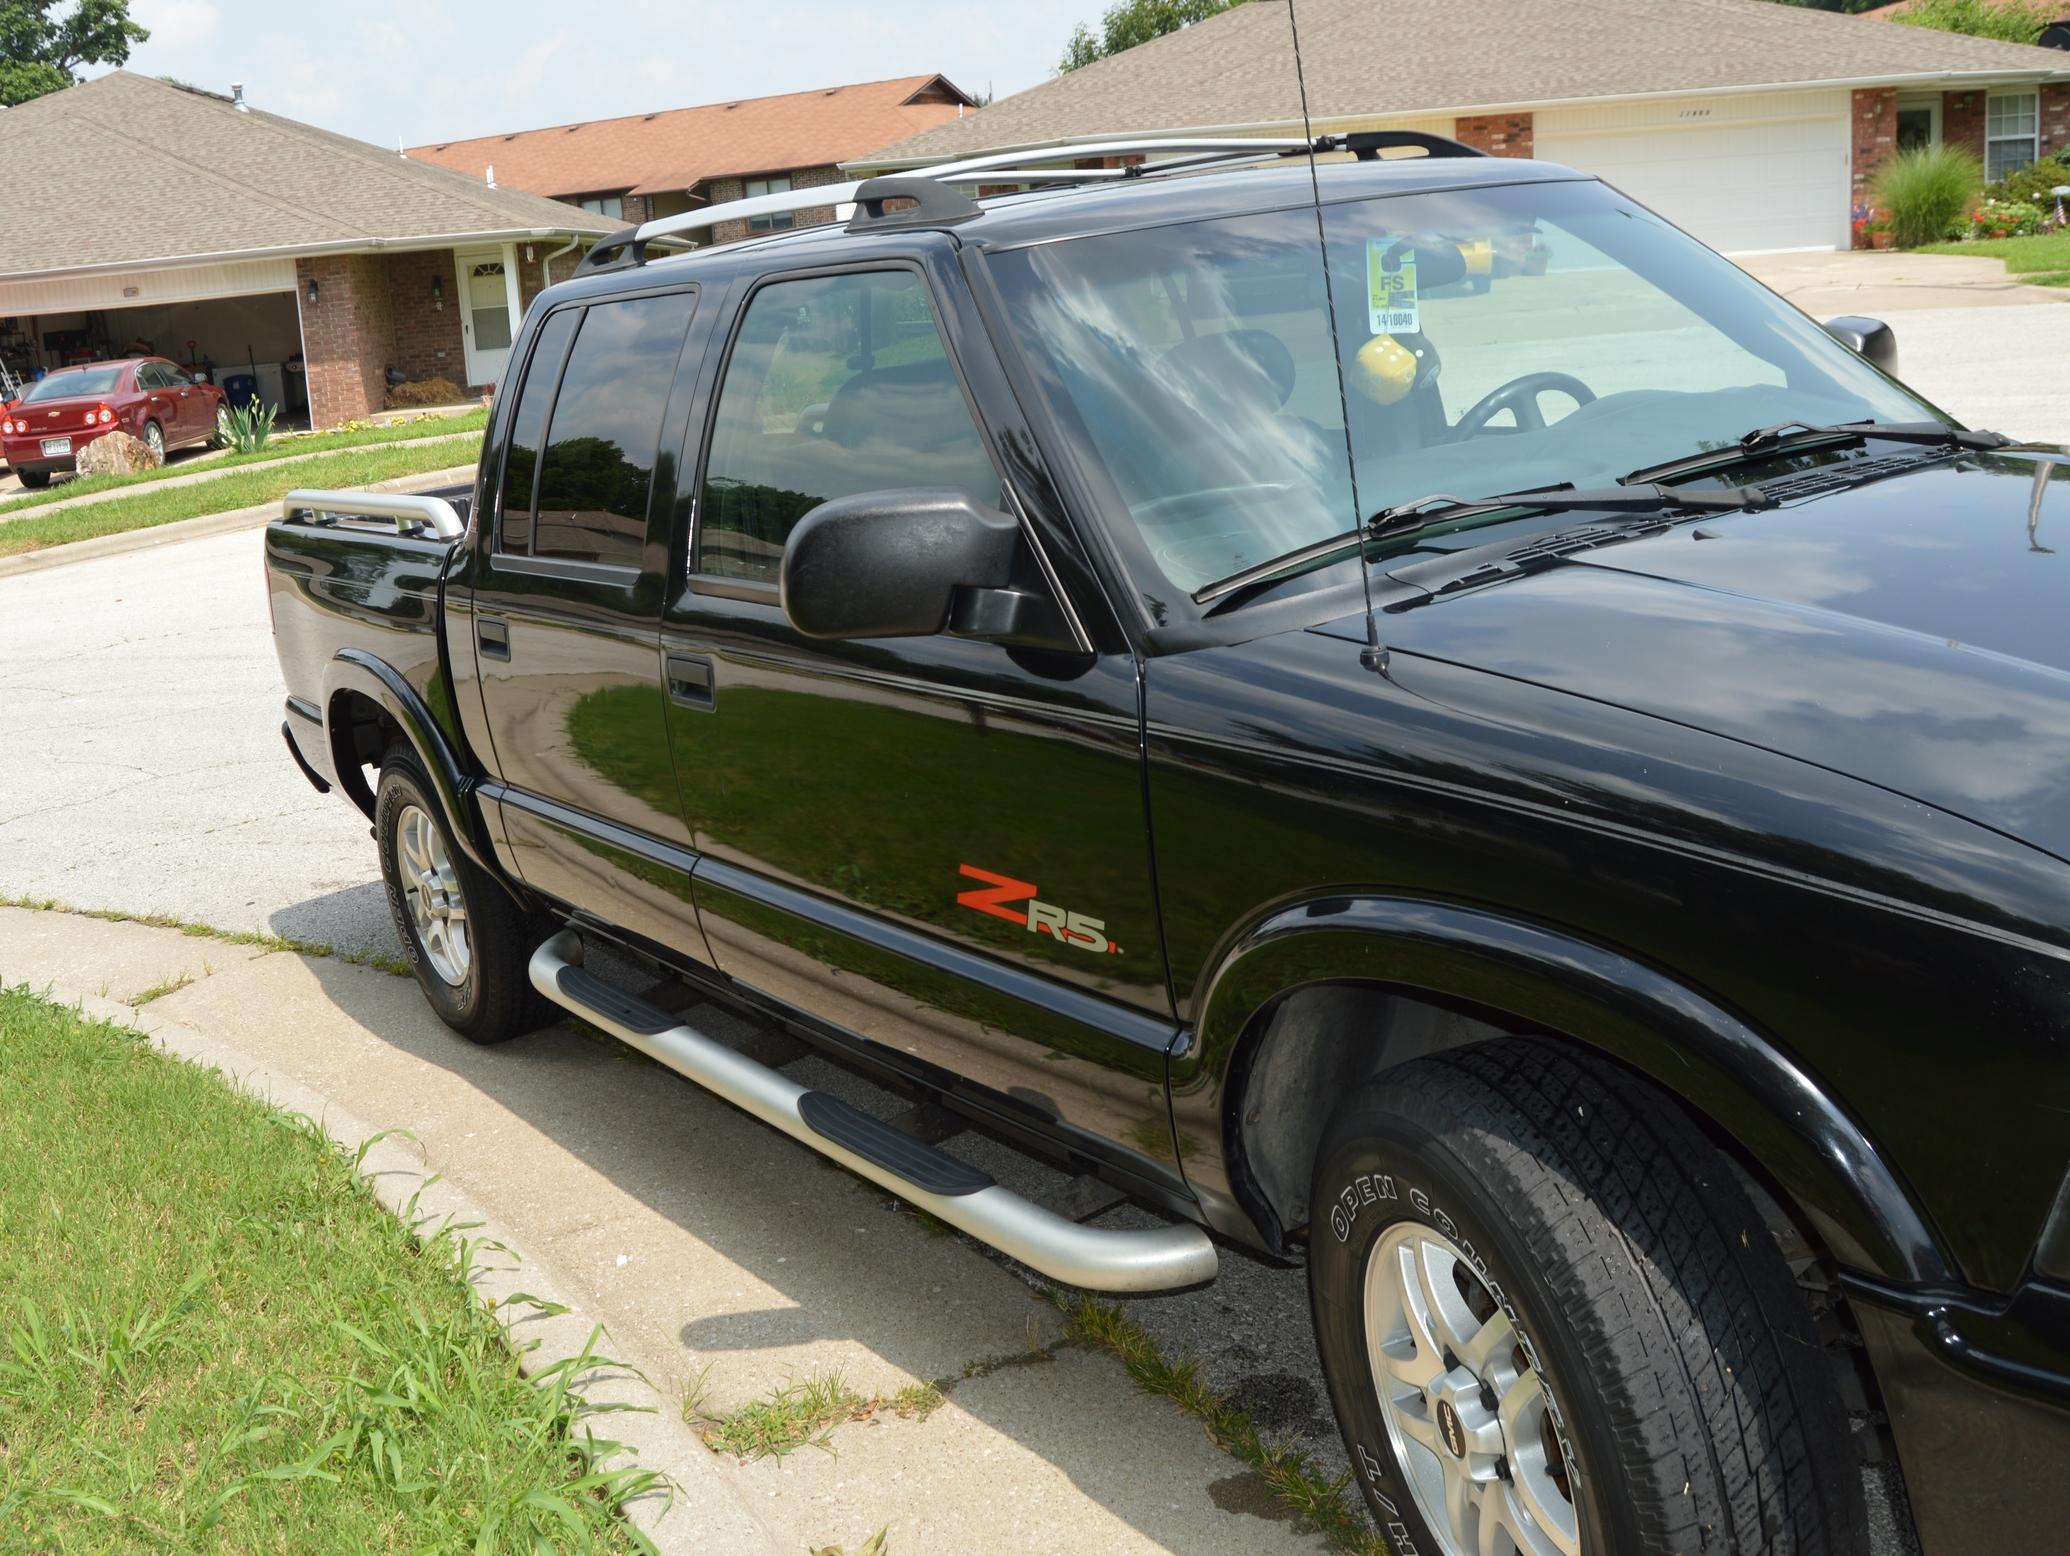 2006 Gmc Sonoma Detail Headlights And Interior Pride Auto Detailing Springfield Mo